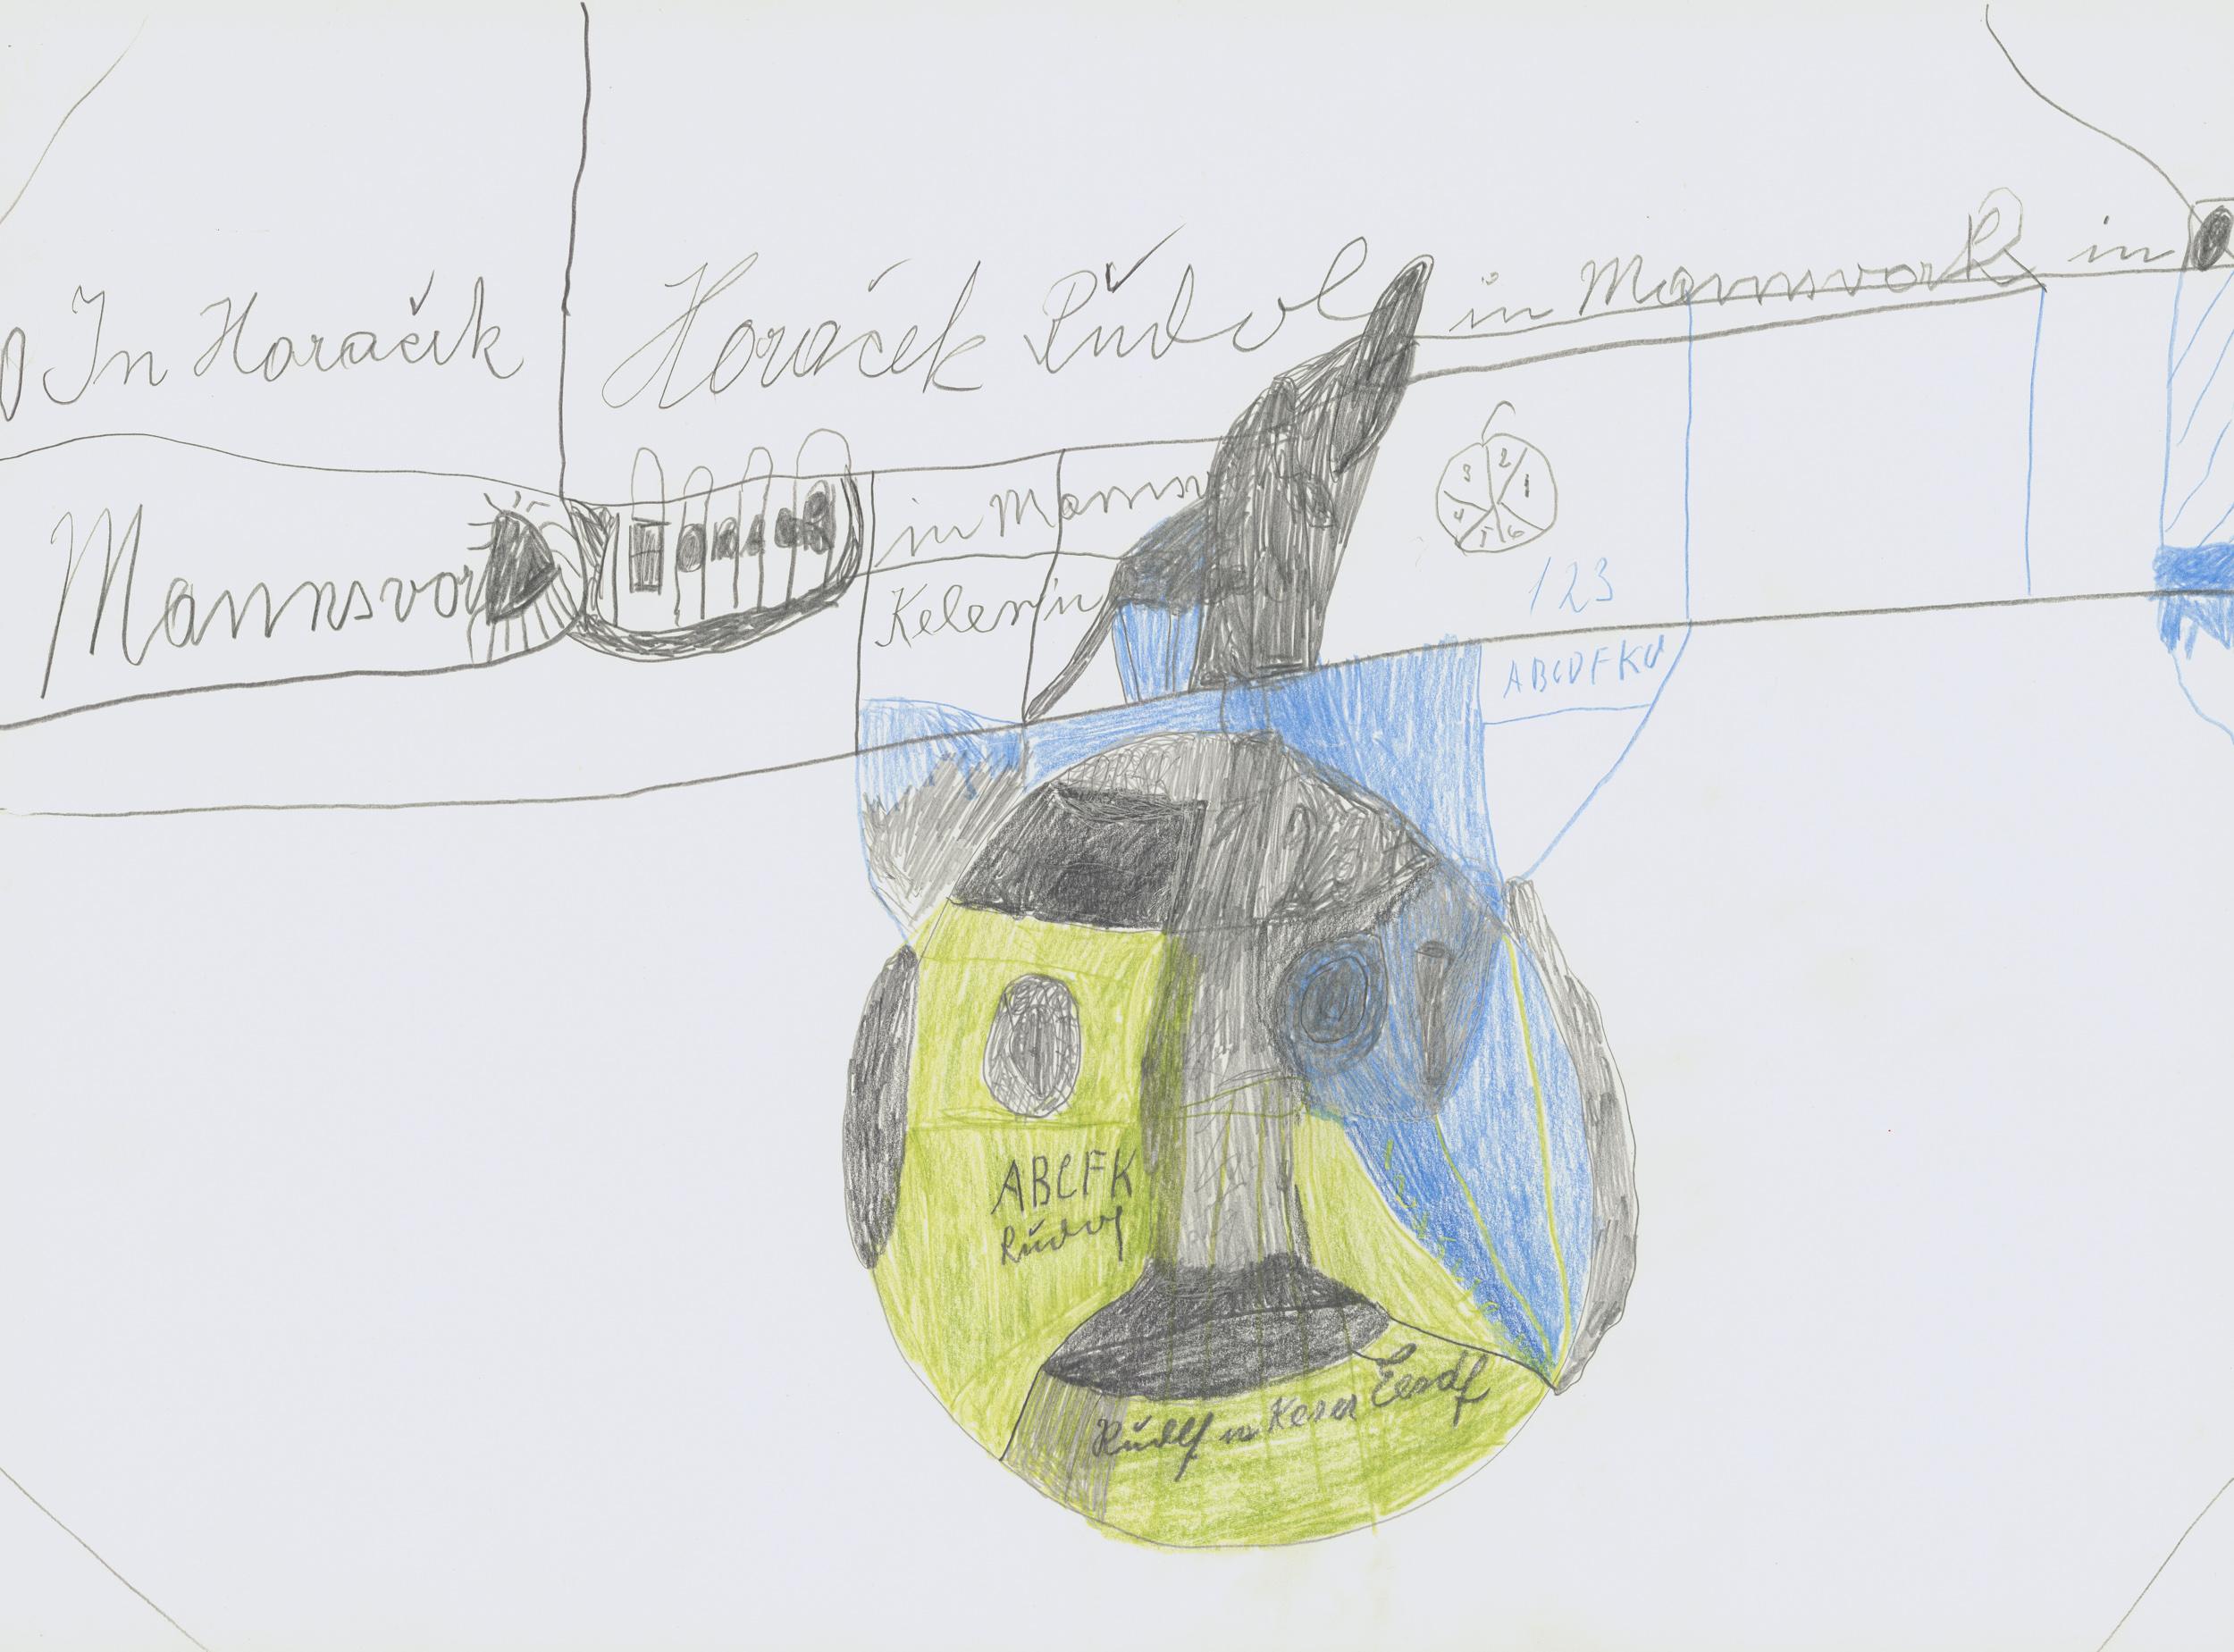 horacek rudolf - ohne titel / untitled